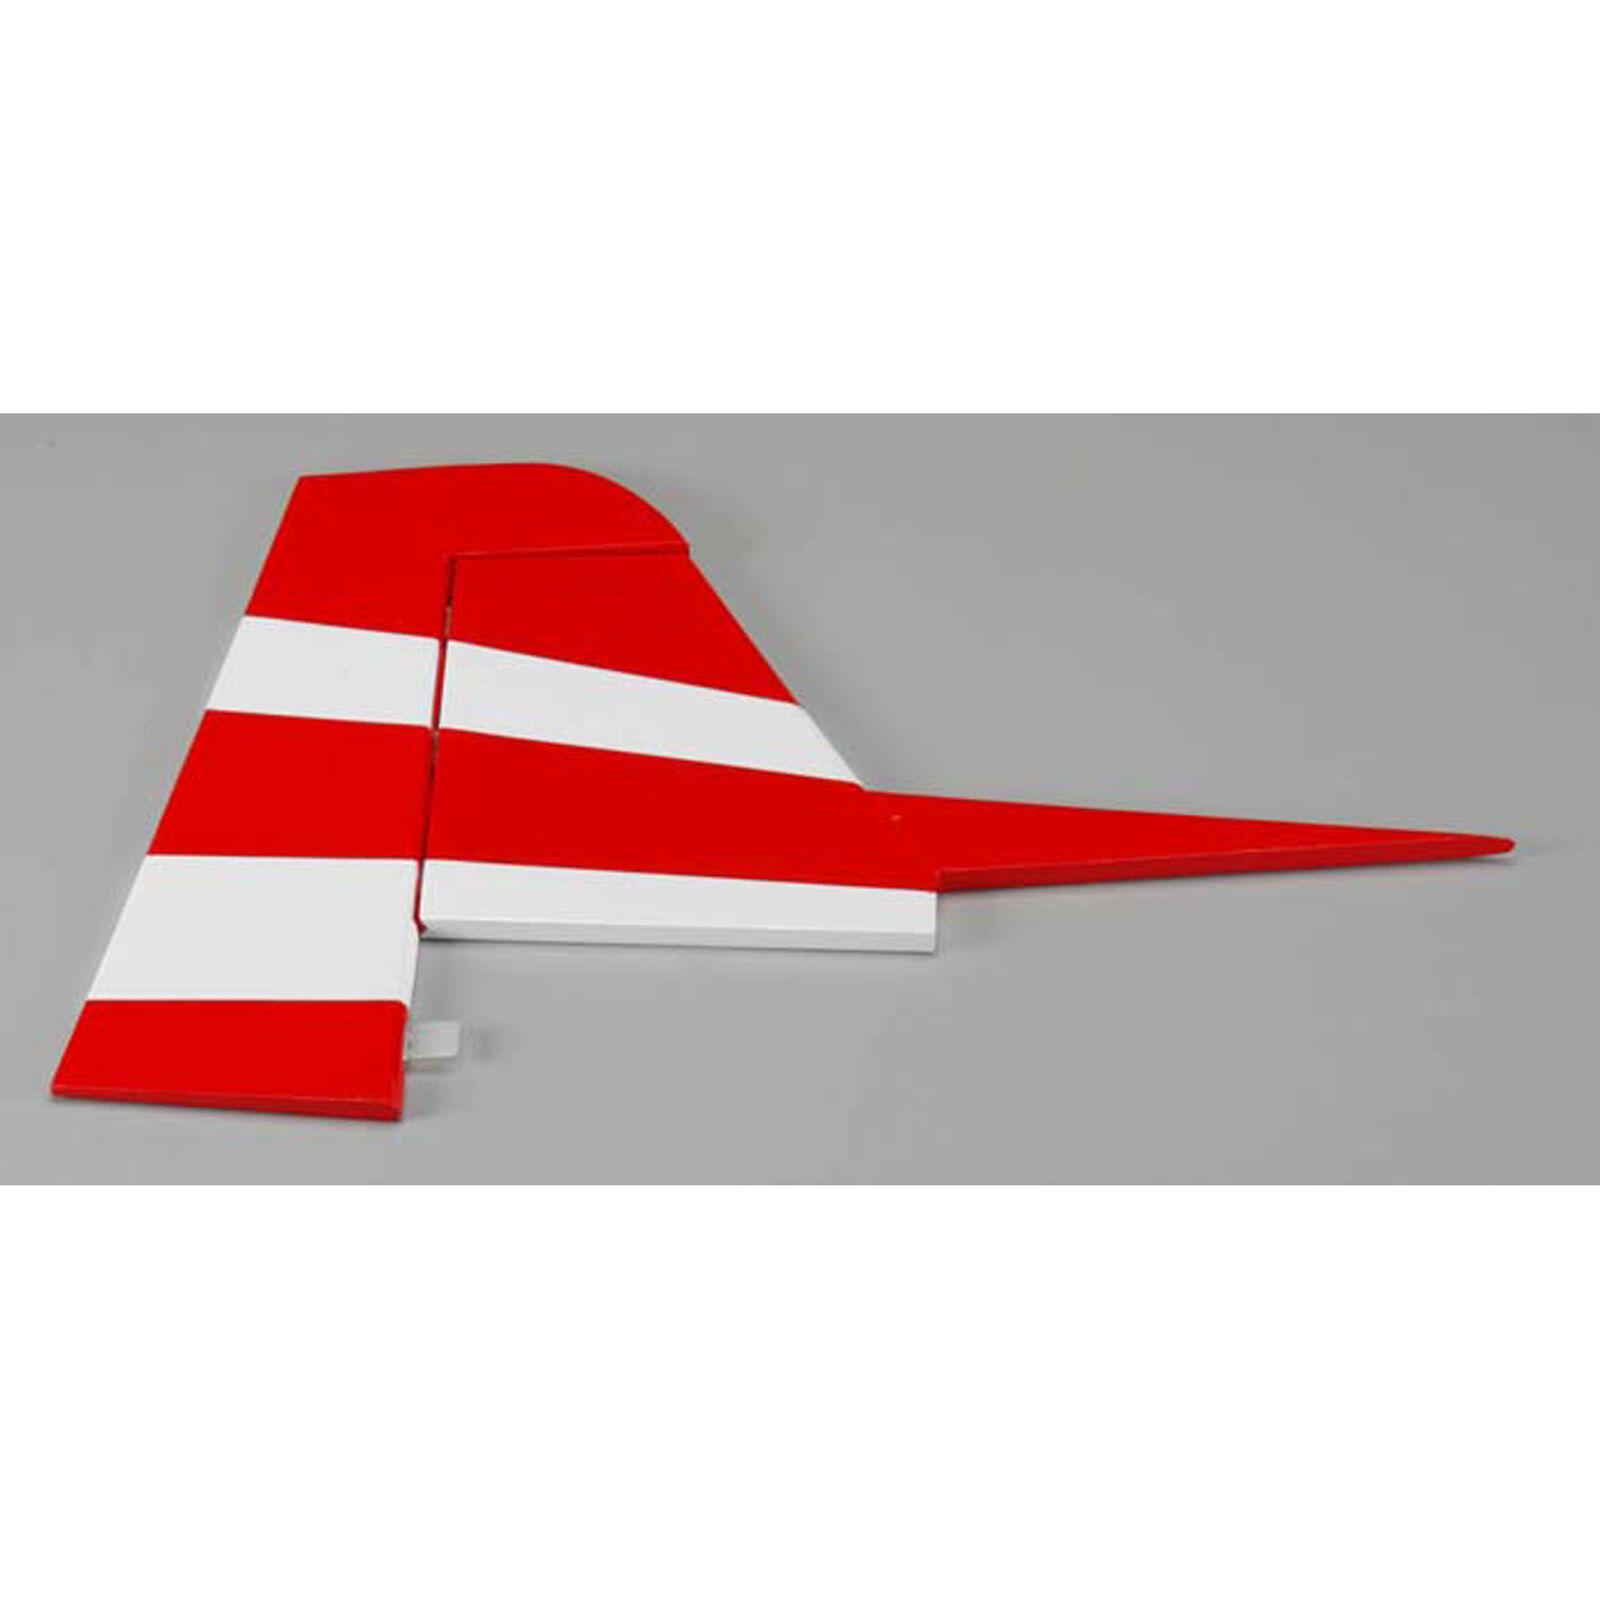 Vertical Stabilizer Tucano ARF